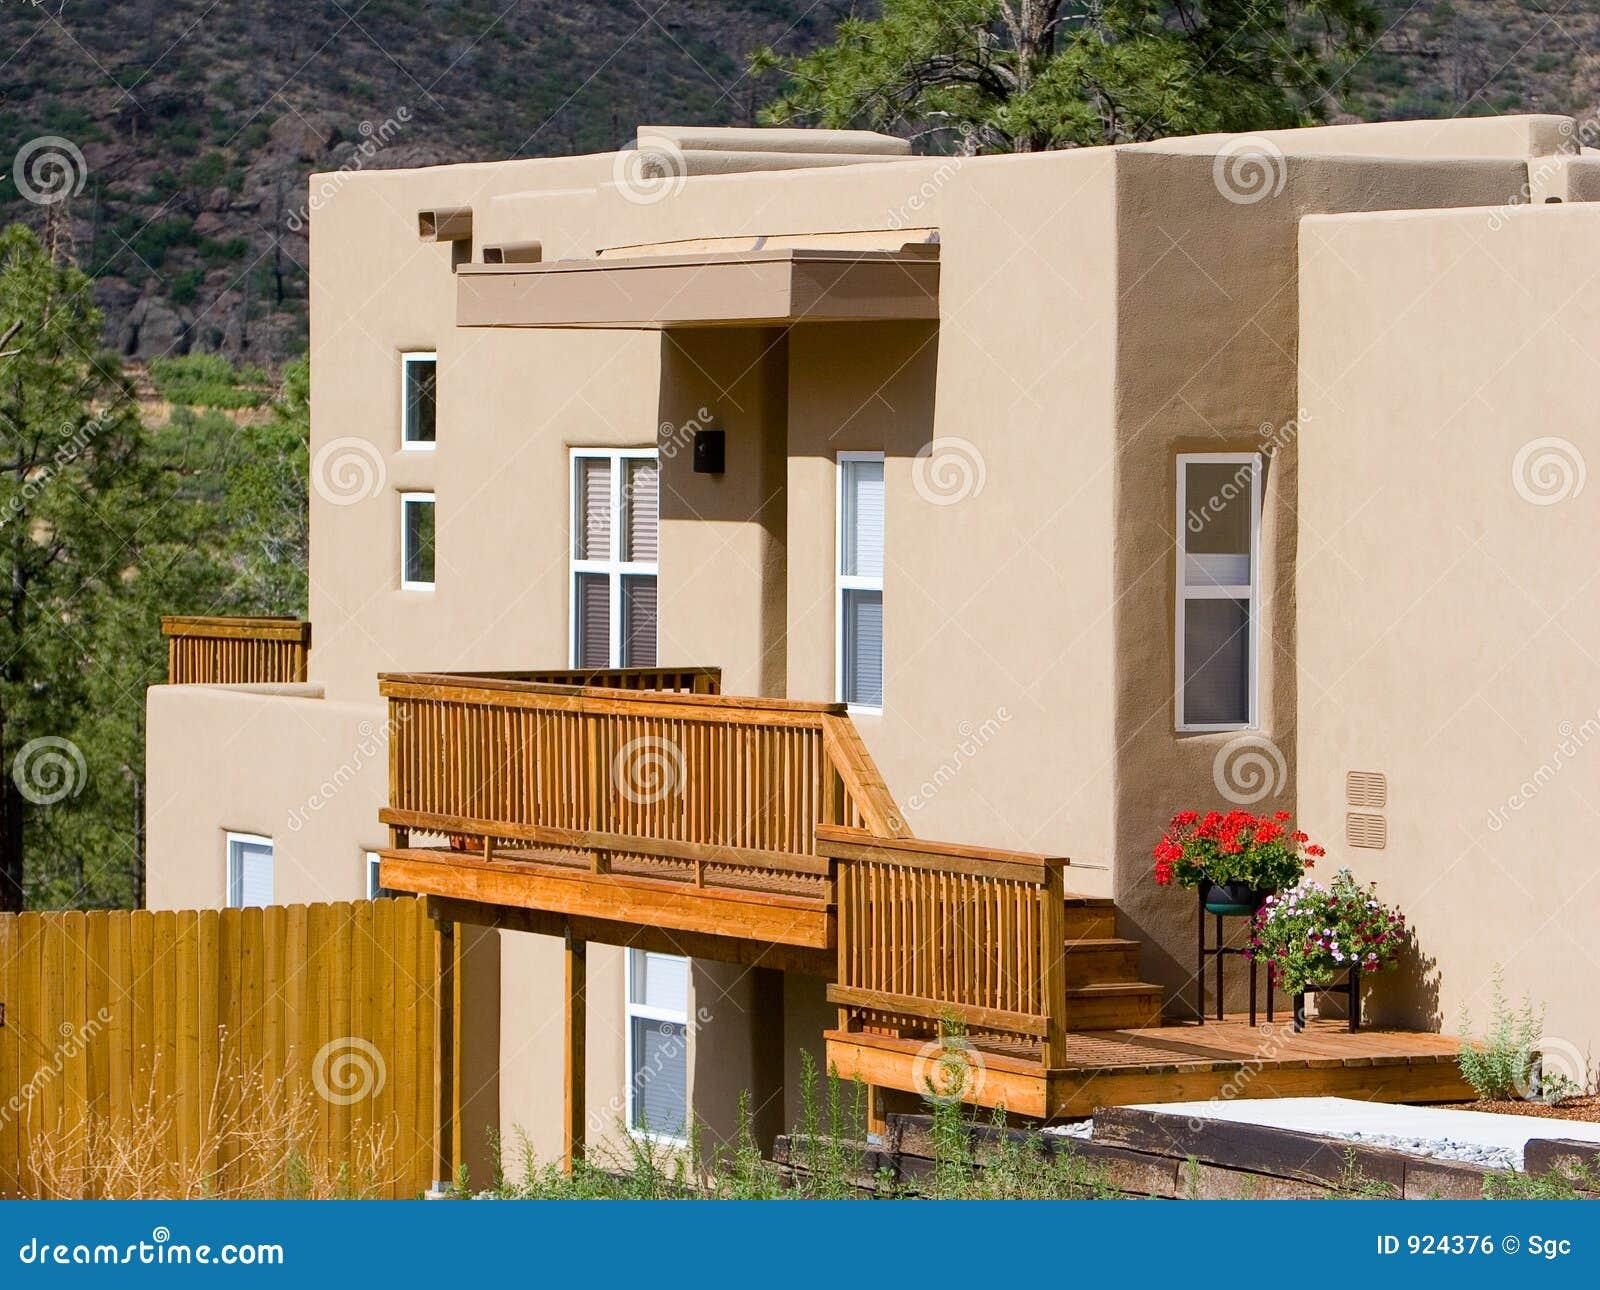 Adobe style house stock photo image of house dwelling for Adobe style house